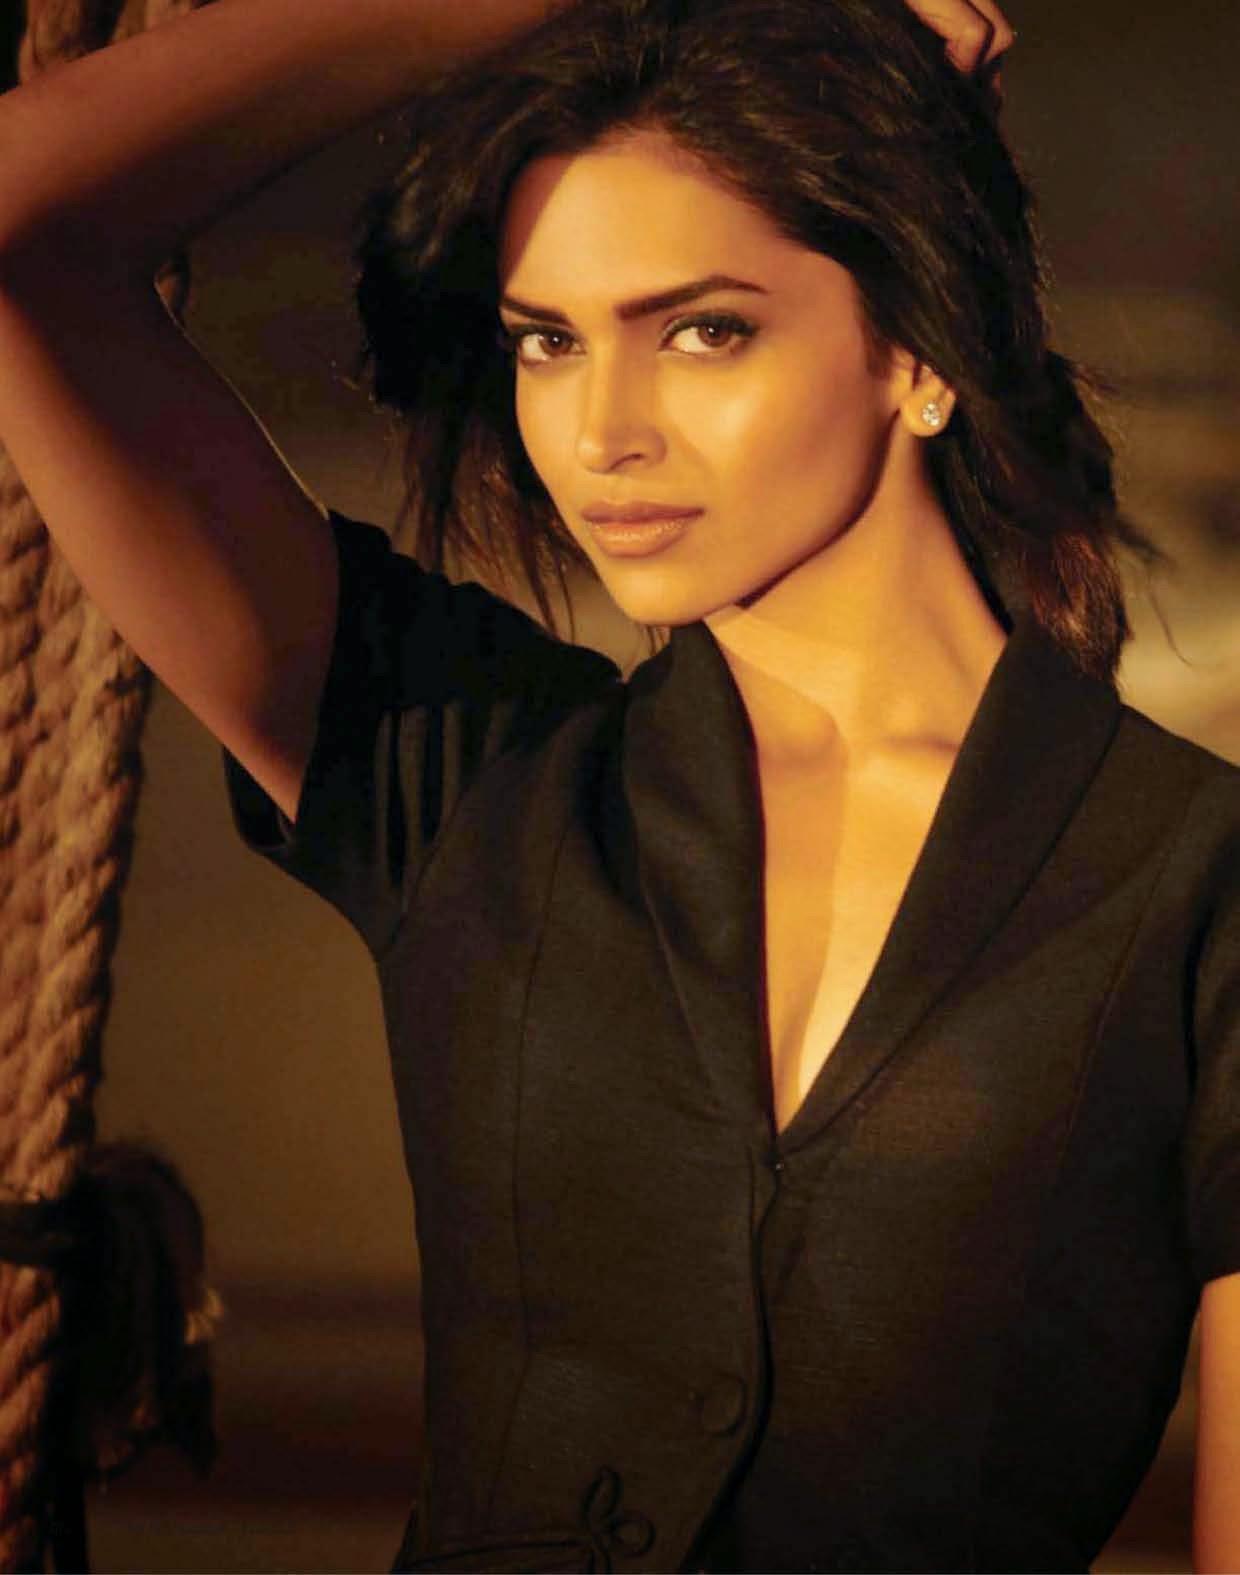 Deepika Padukone Hottest Without makeup bollywoodactress Photoshoot